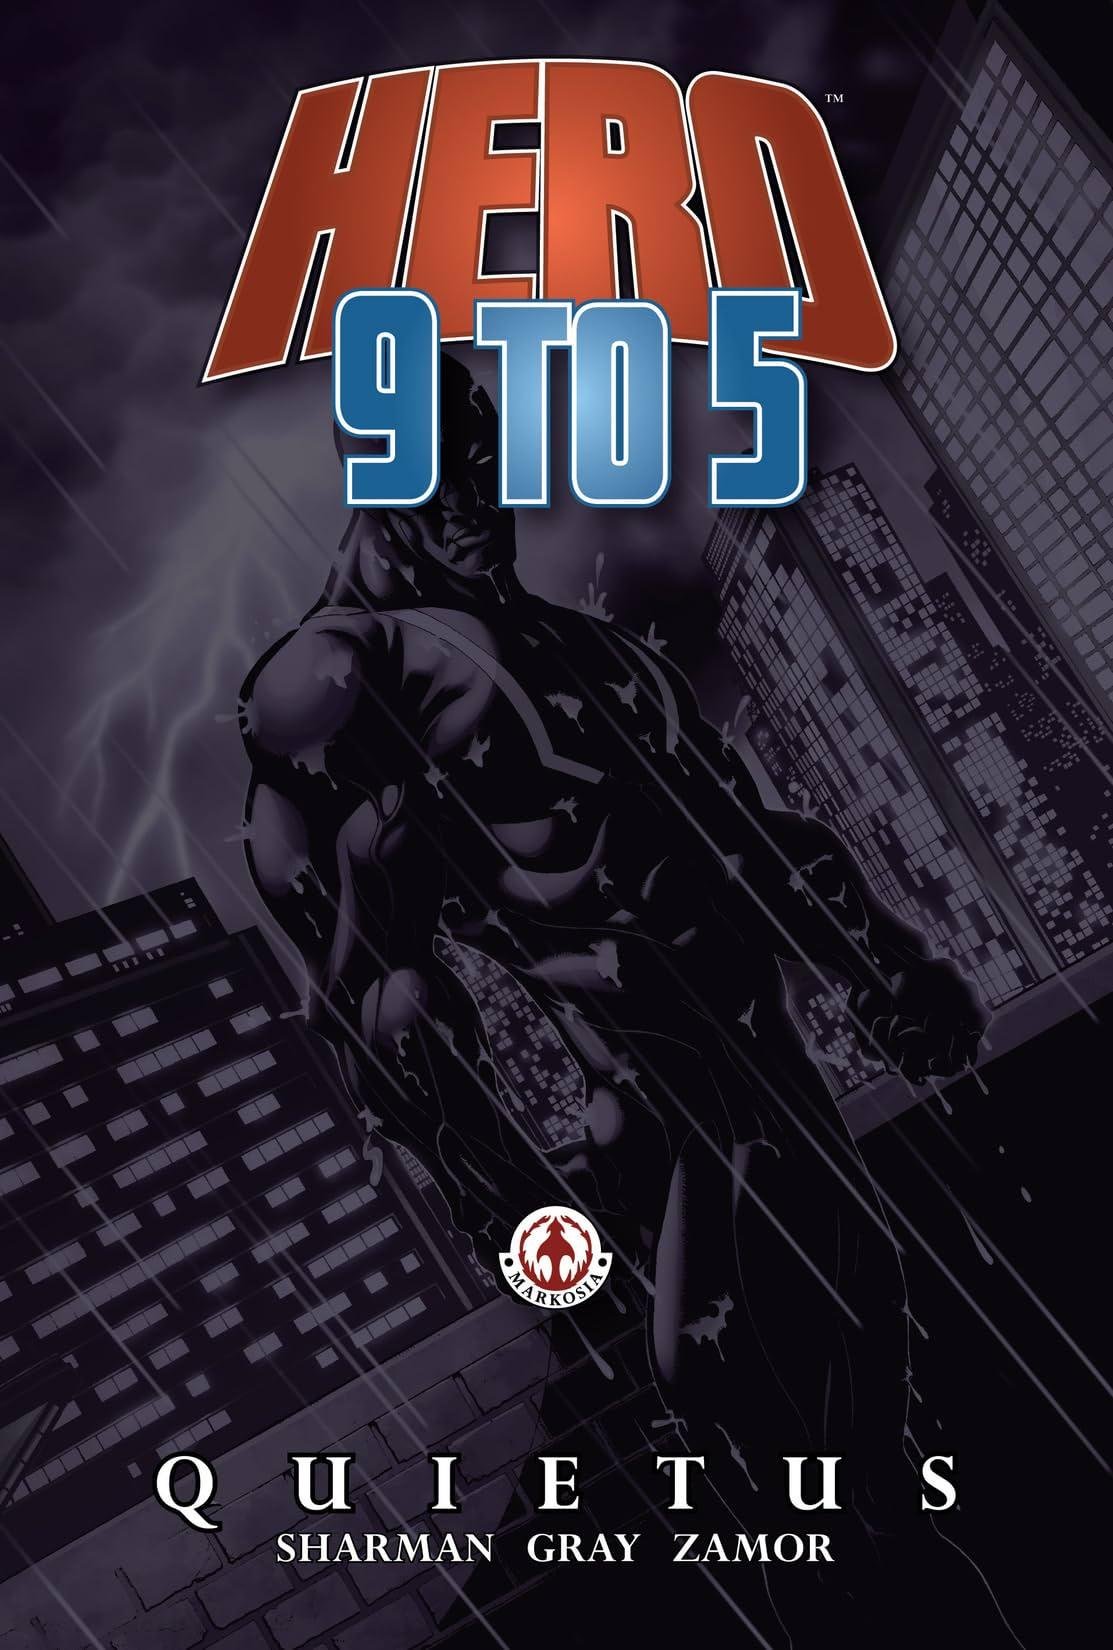 Hero: 9 To 5: Quietus